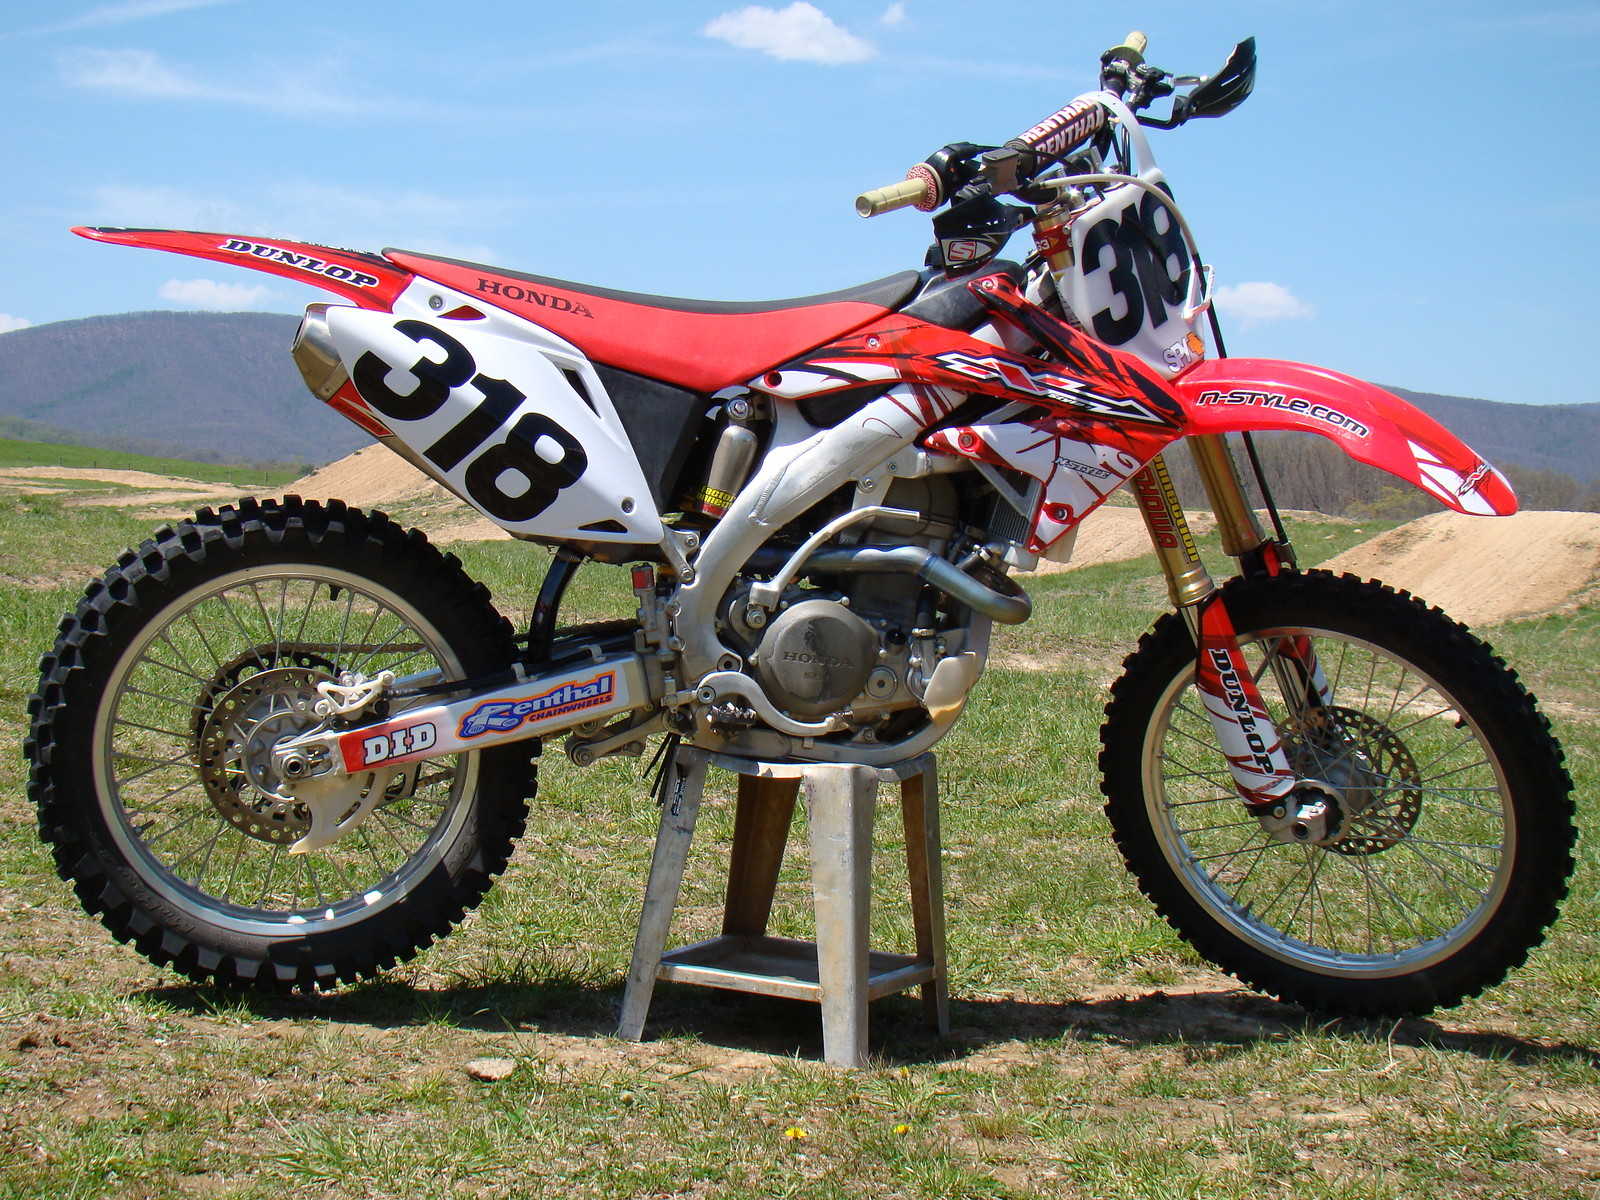 07' CRF - MxPro318 - Motocross Pictures - Vital MX